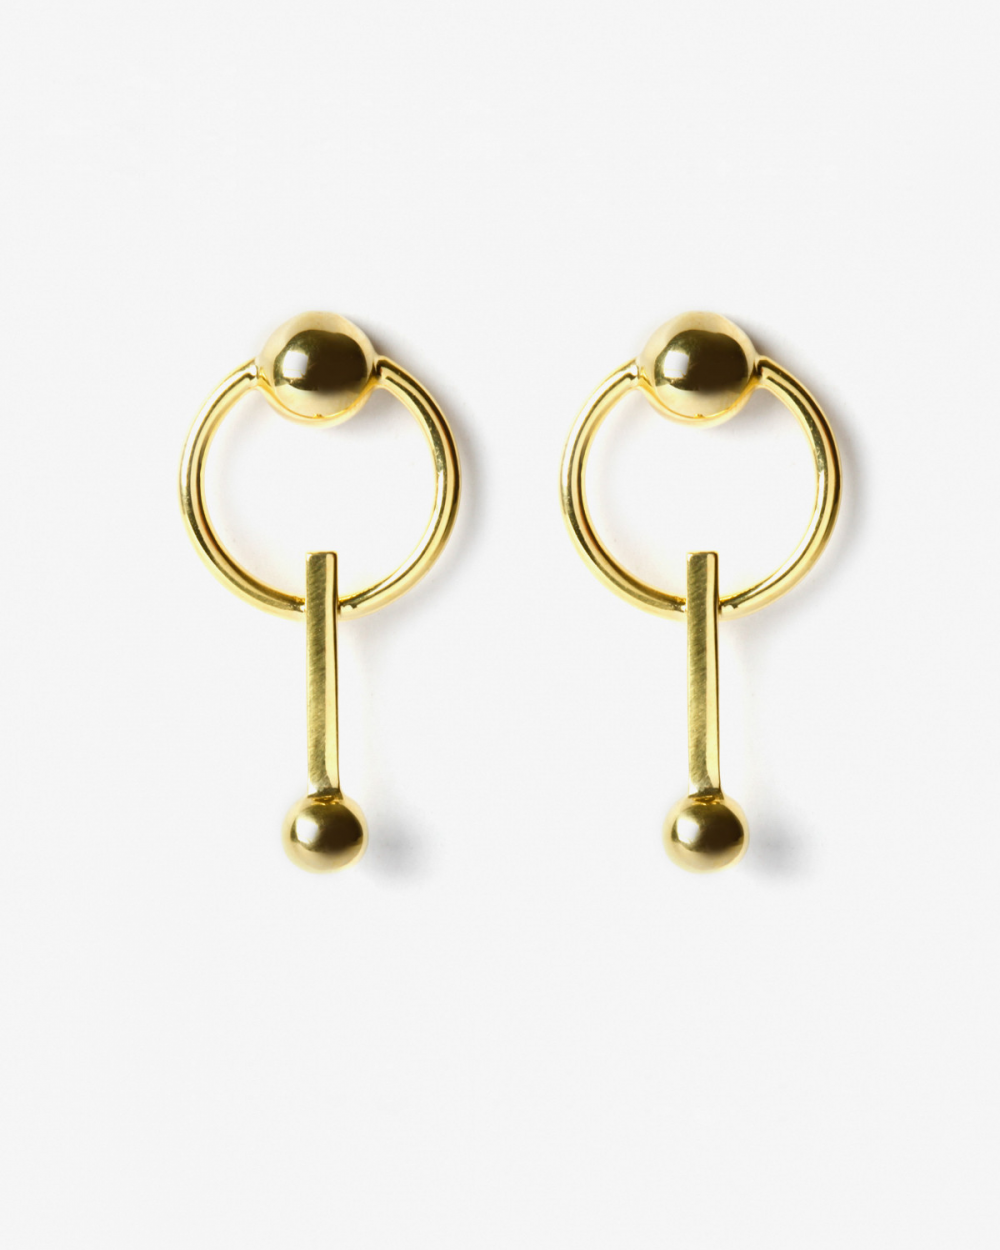 Earrings YELLOW GOLD GALAXY EARRINGS NOVE25